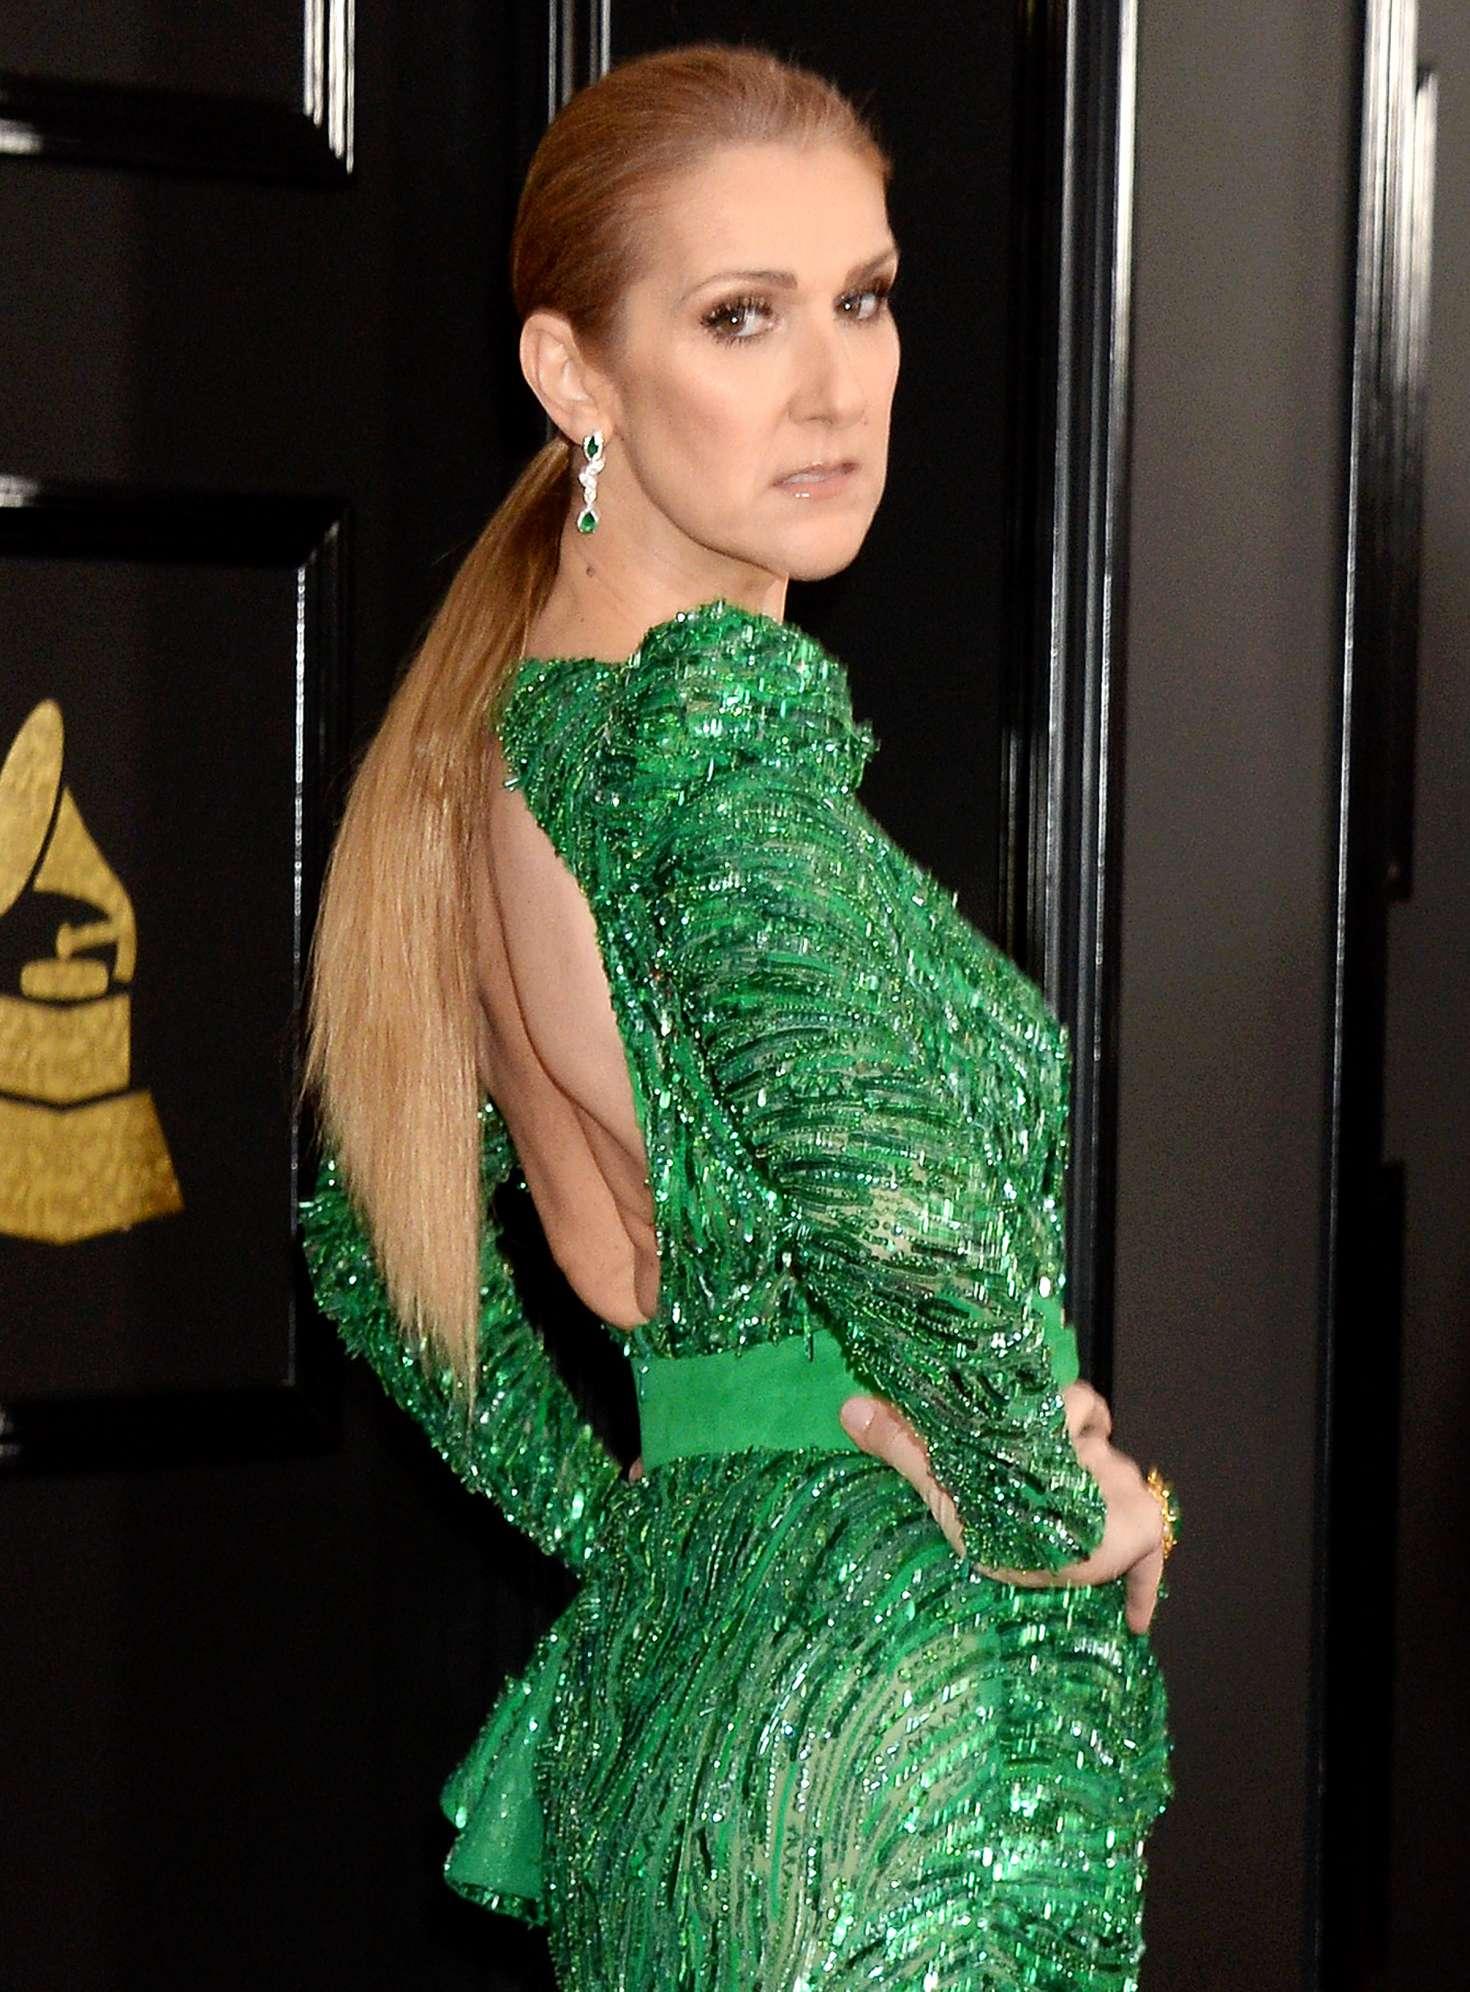 Celine Dion 10 Days - Celine Dion Songs Age